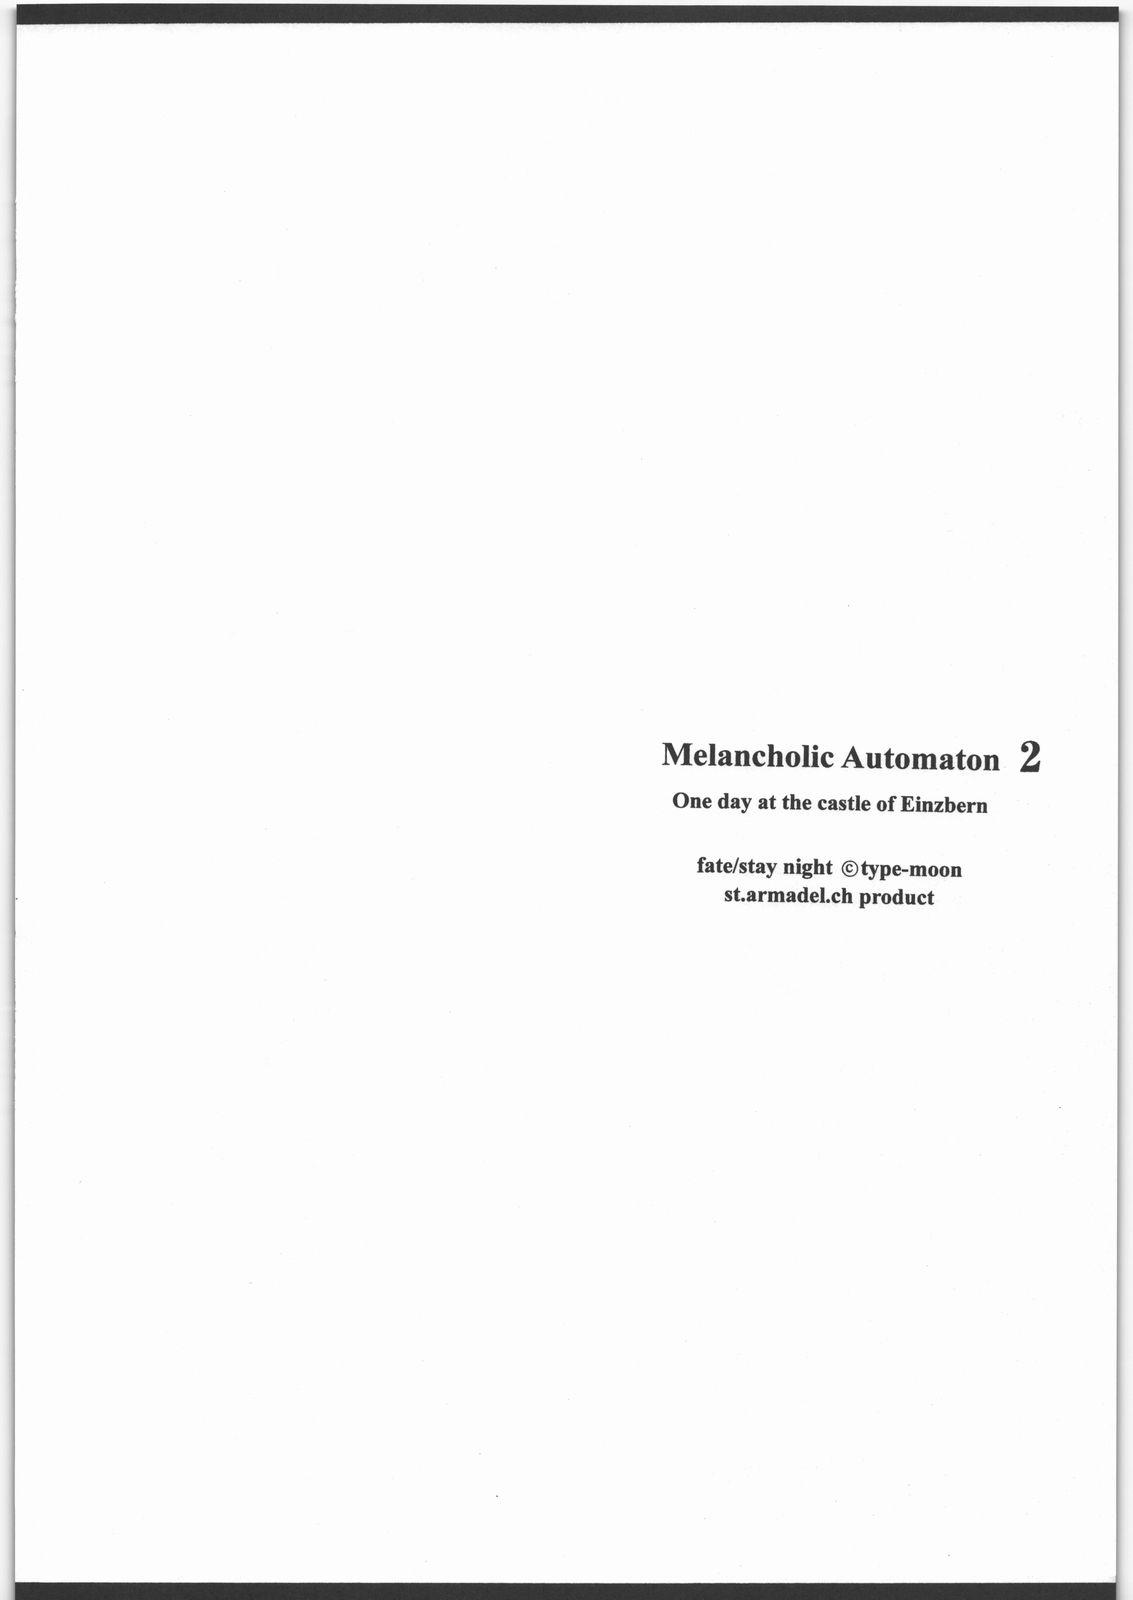 Melancholic Automaton 2 - One day at the castle of Einzbern 2